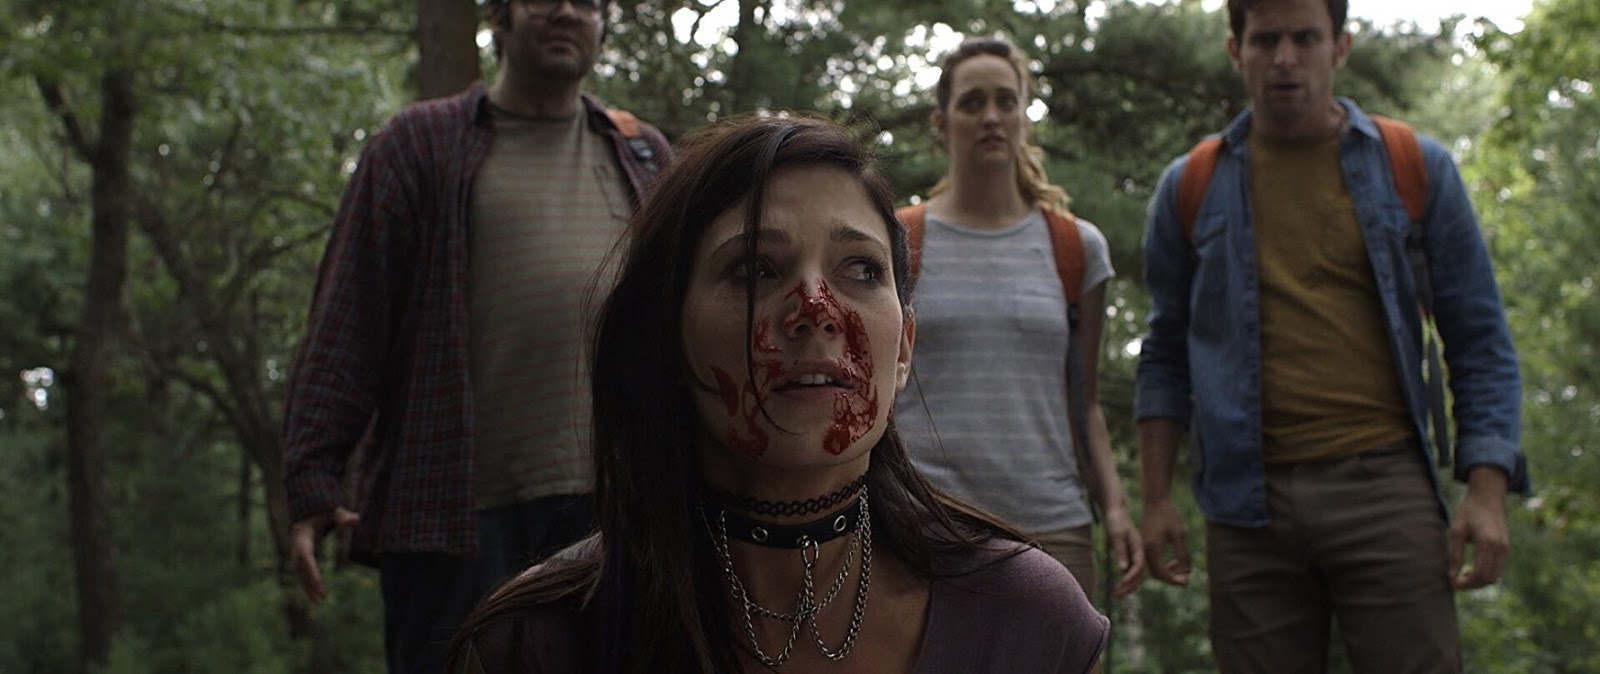 [Seattle International Film Festival] Ruin Me (2017) - Reviewed